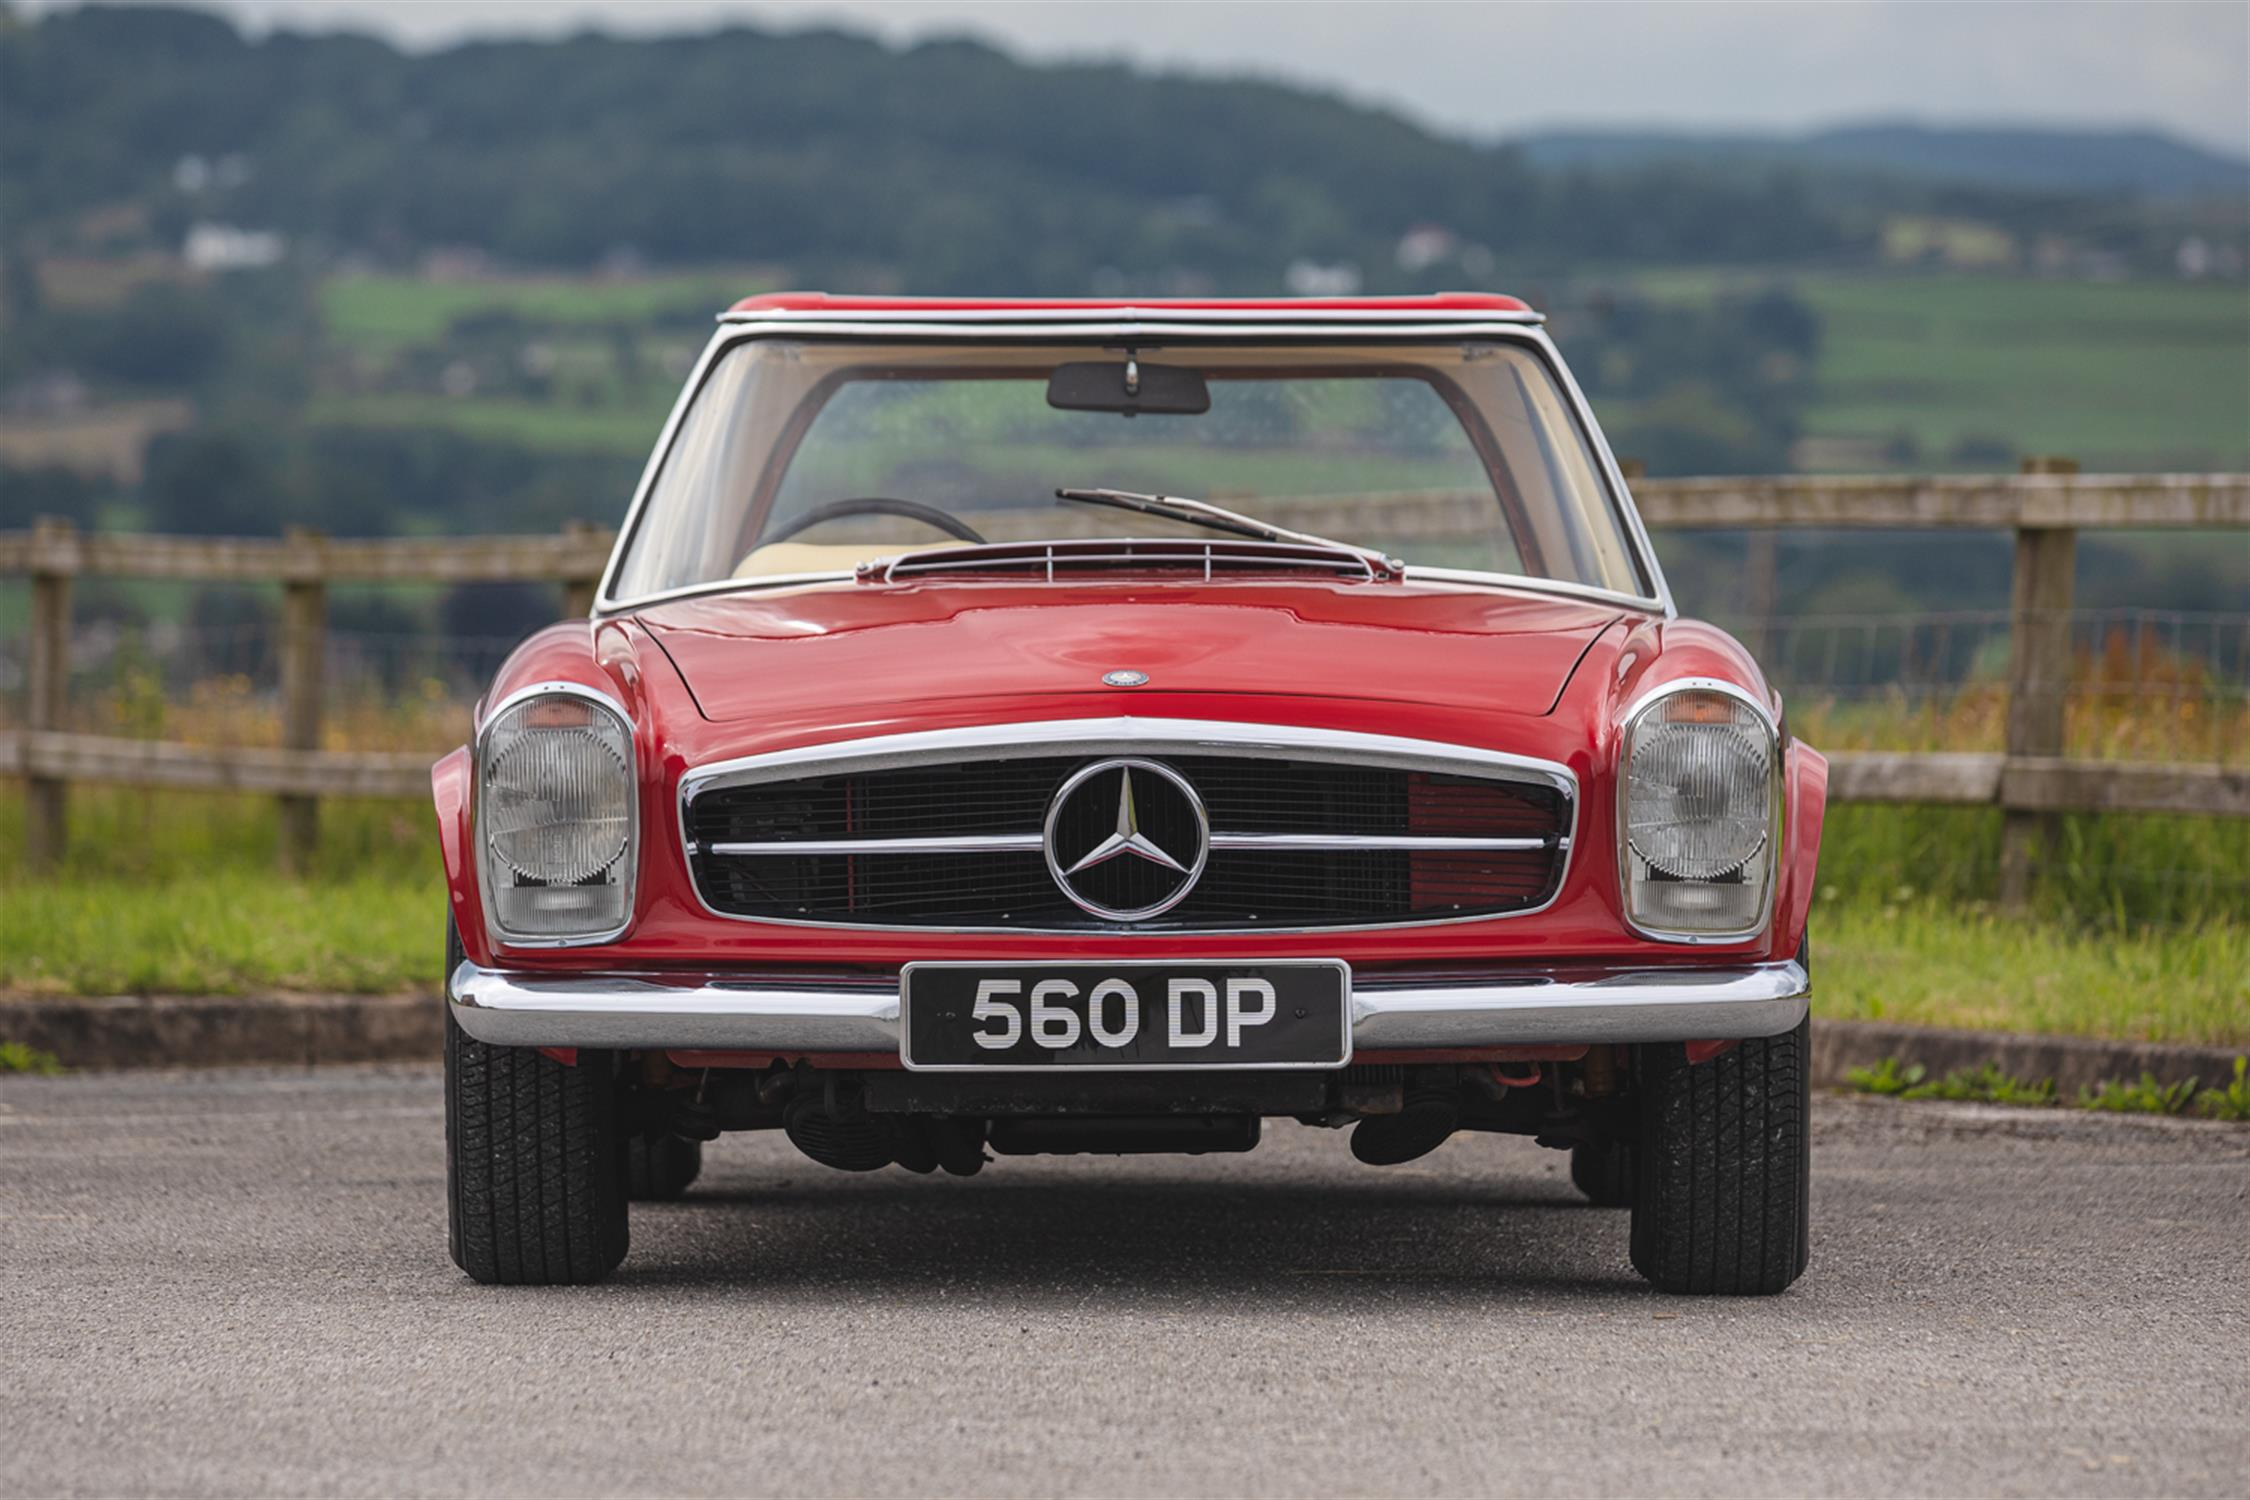 1969 Mercedes-Benz 280SL (W113) - Image 6 of 10